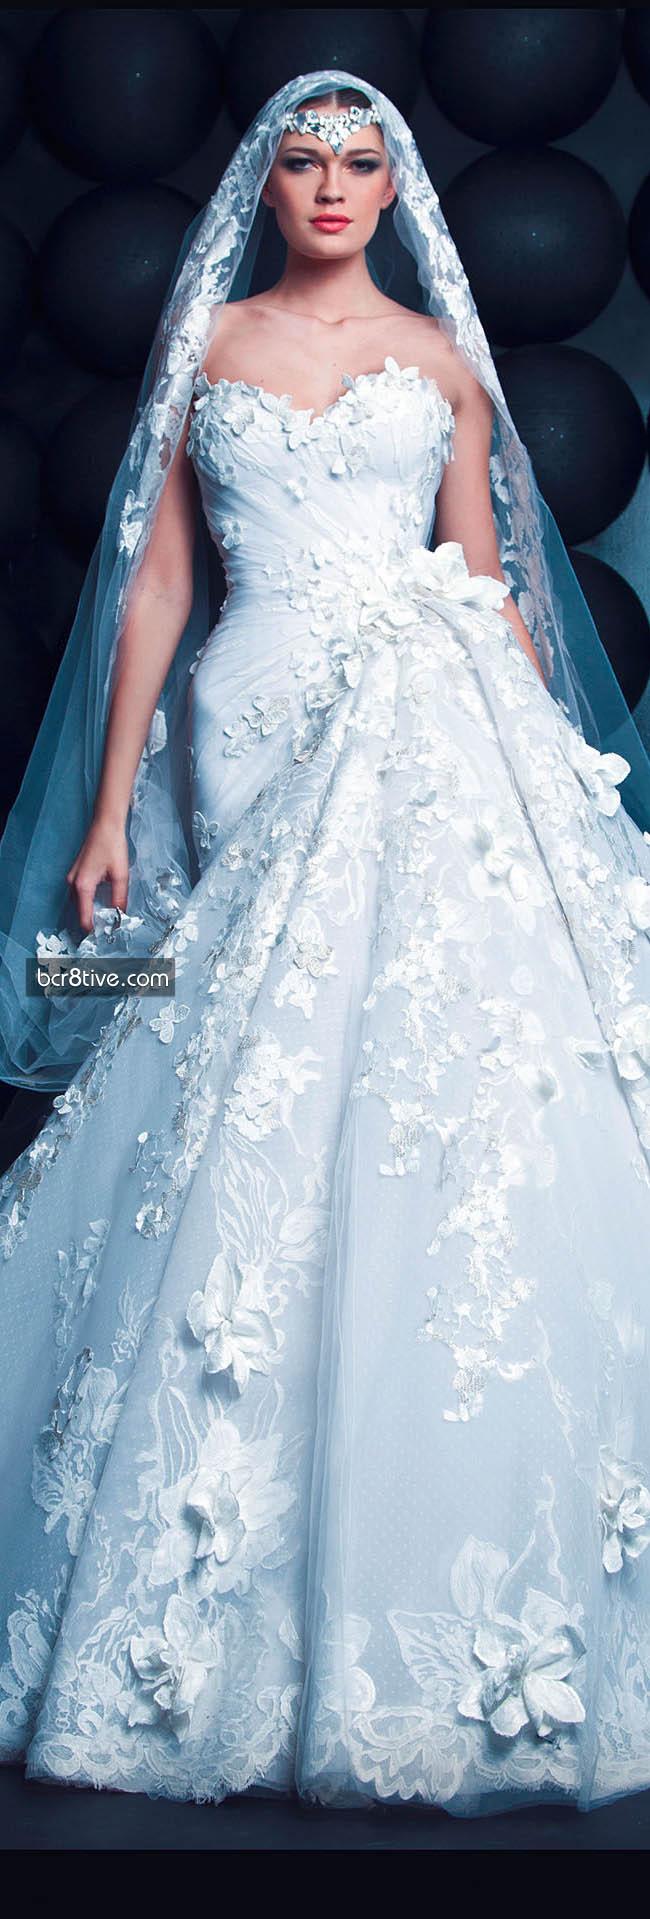 Николя Jebran весна лето 2013 Haute Couture